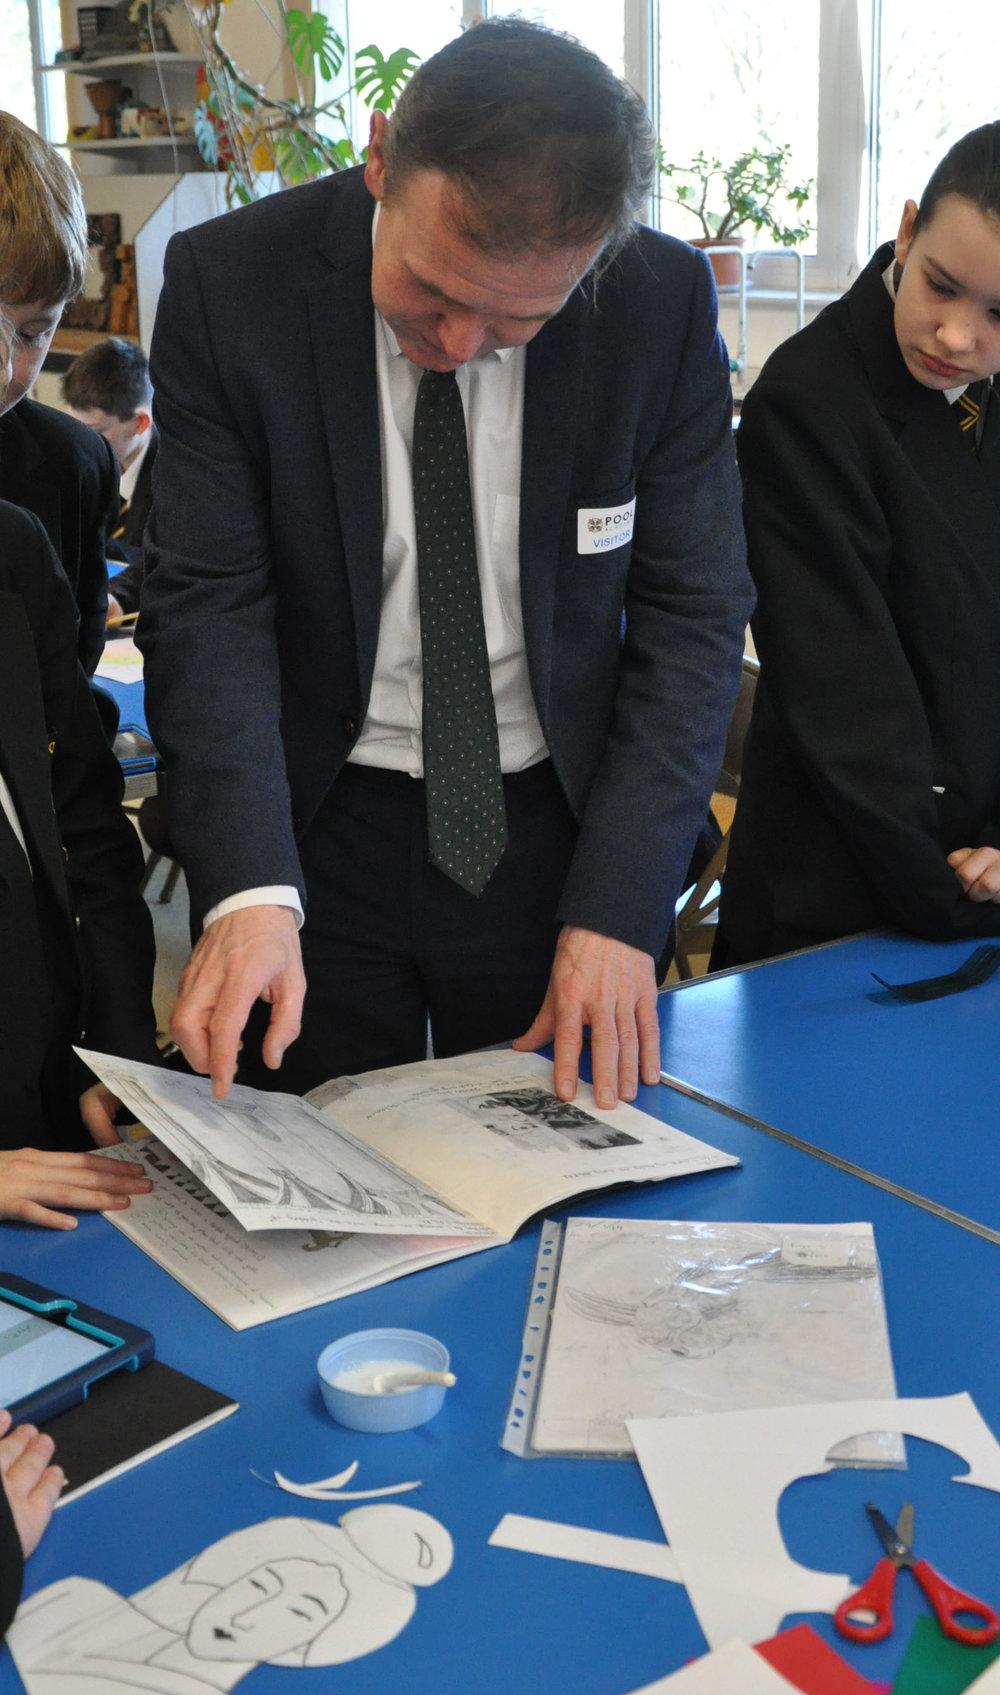 Mr Eustice looking through student's art work.